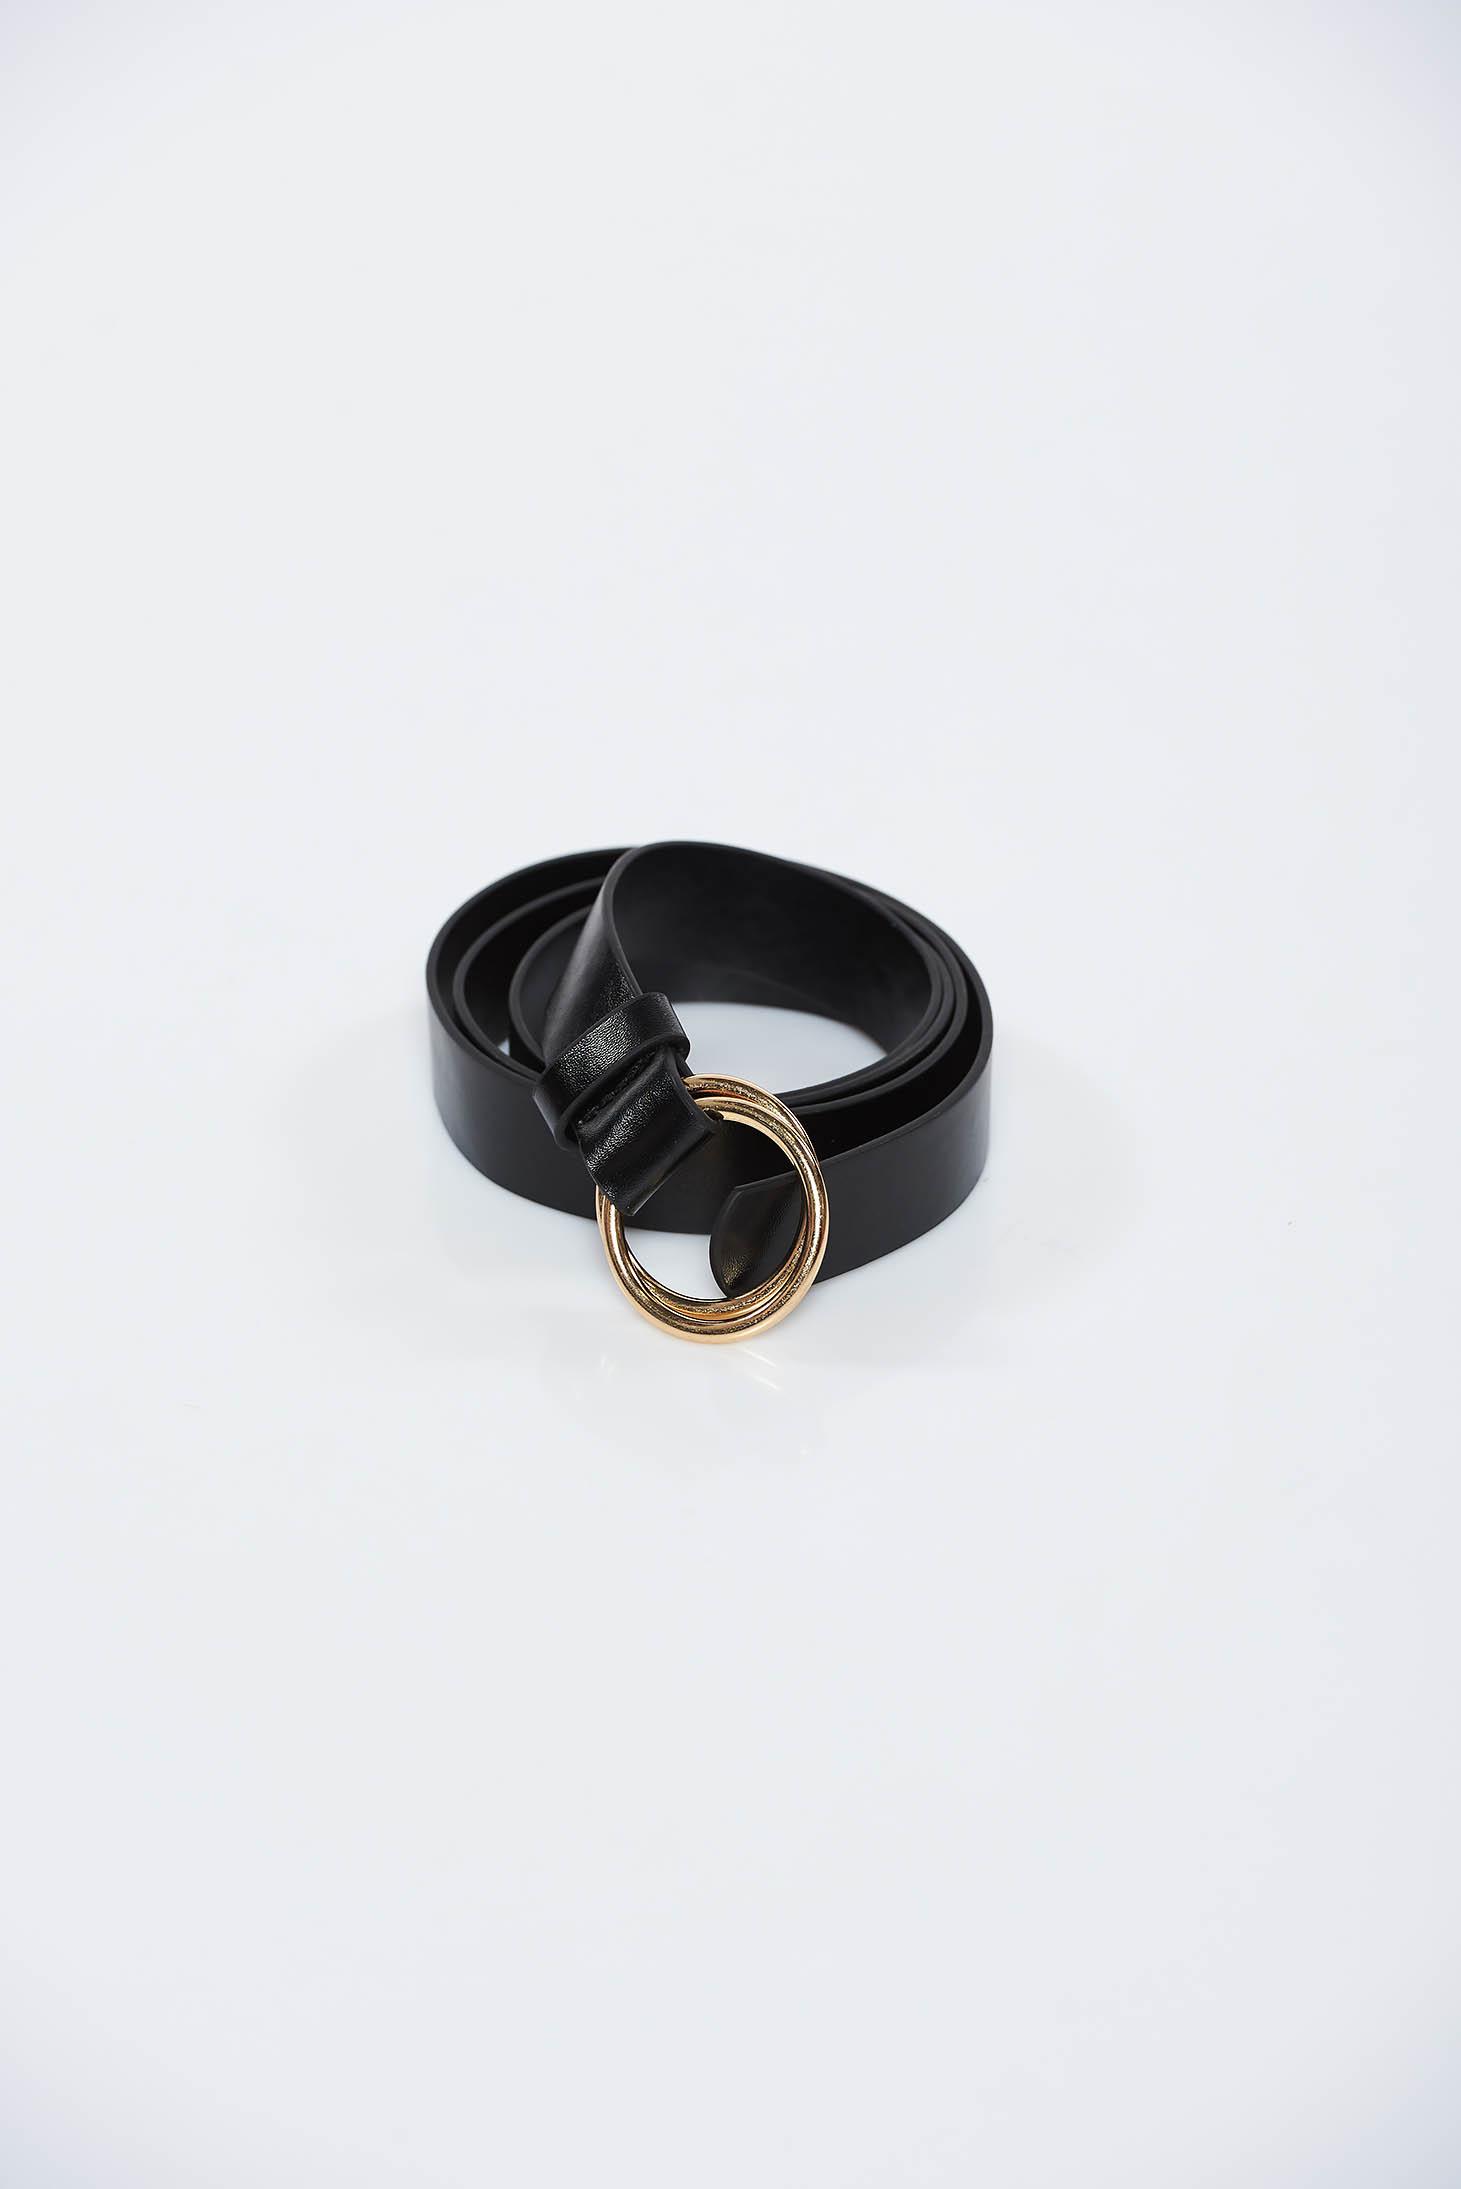 Curea StarShinerS neagra din piele ecologica accesorizata cu o catarama metalica